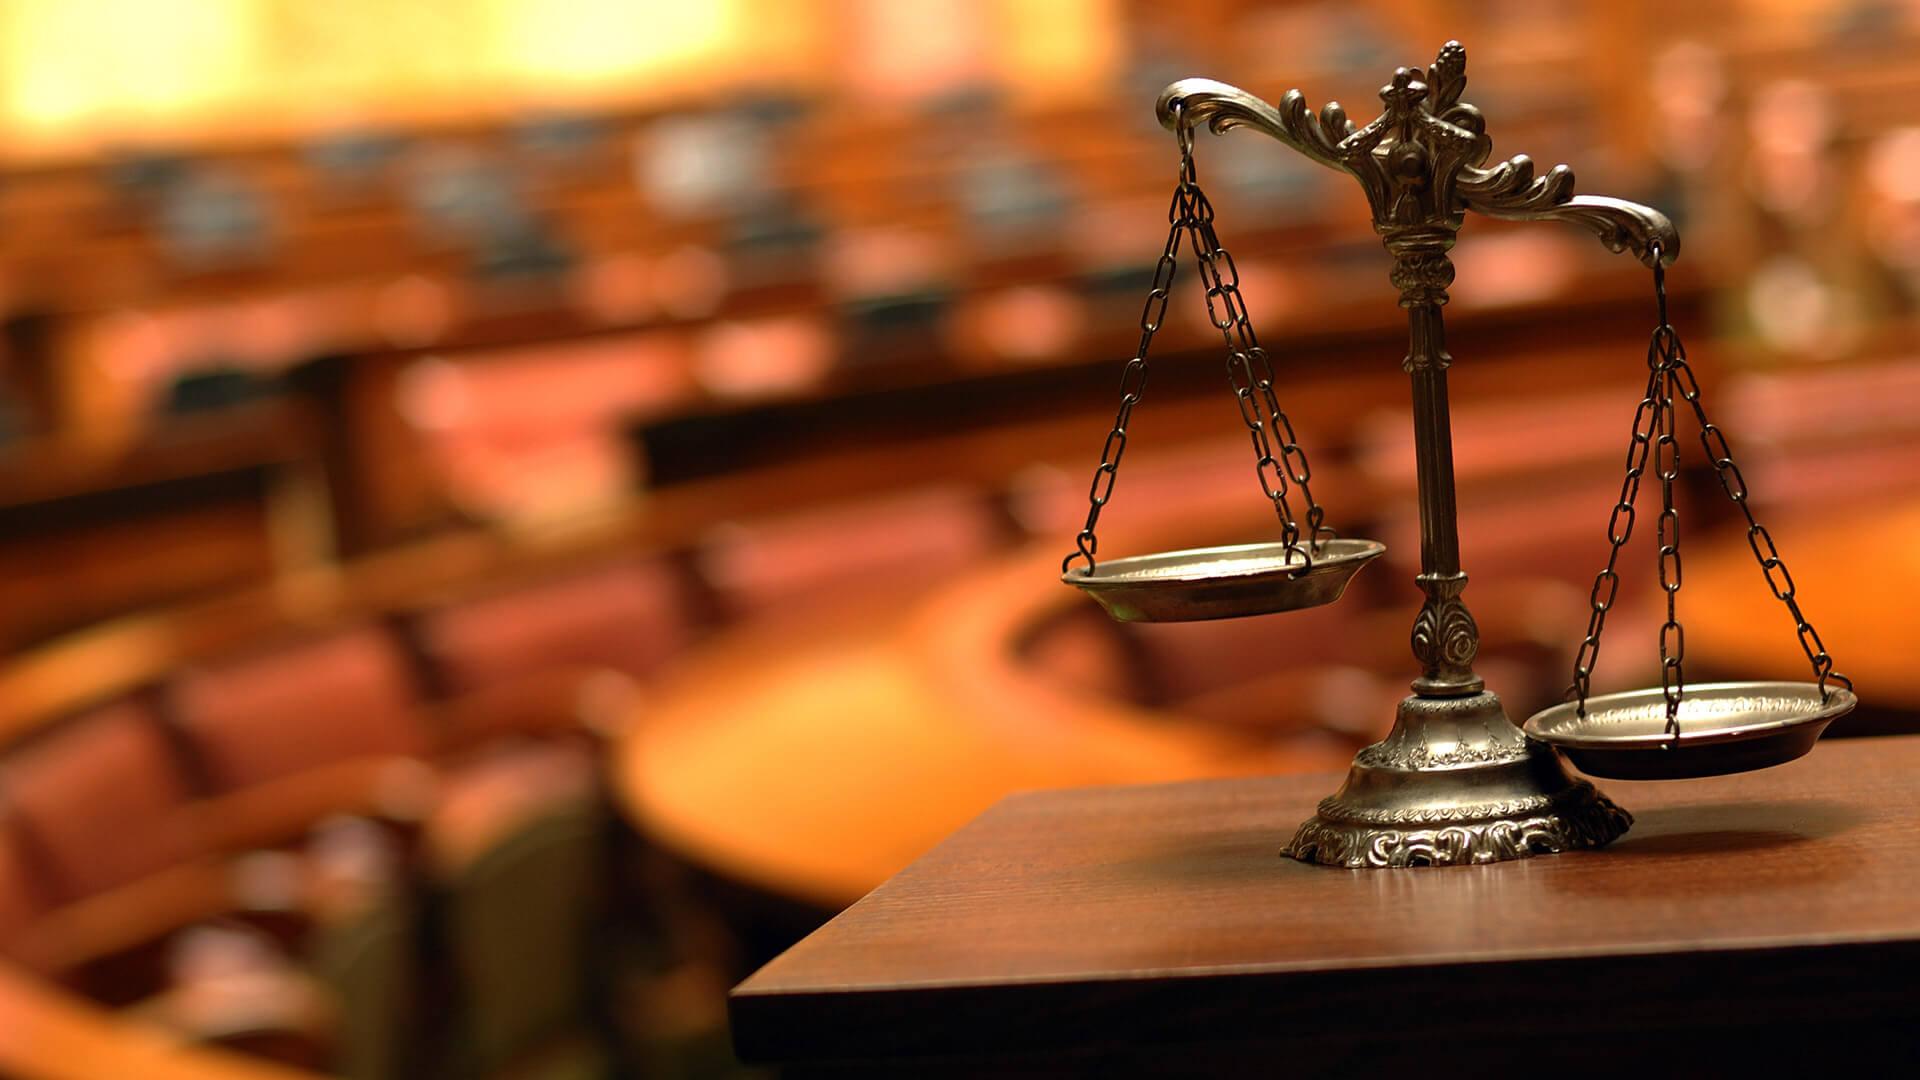 Nuevo sitio Hotspot Law como ZocDoc para abogados